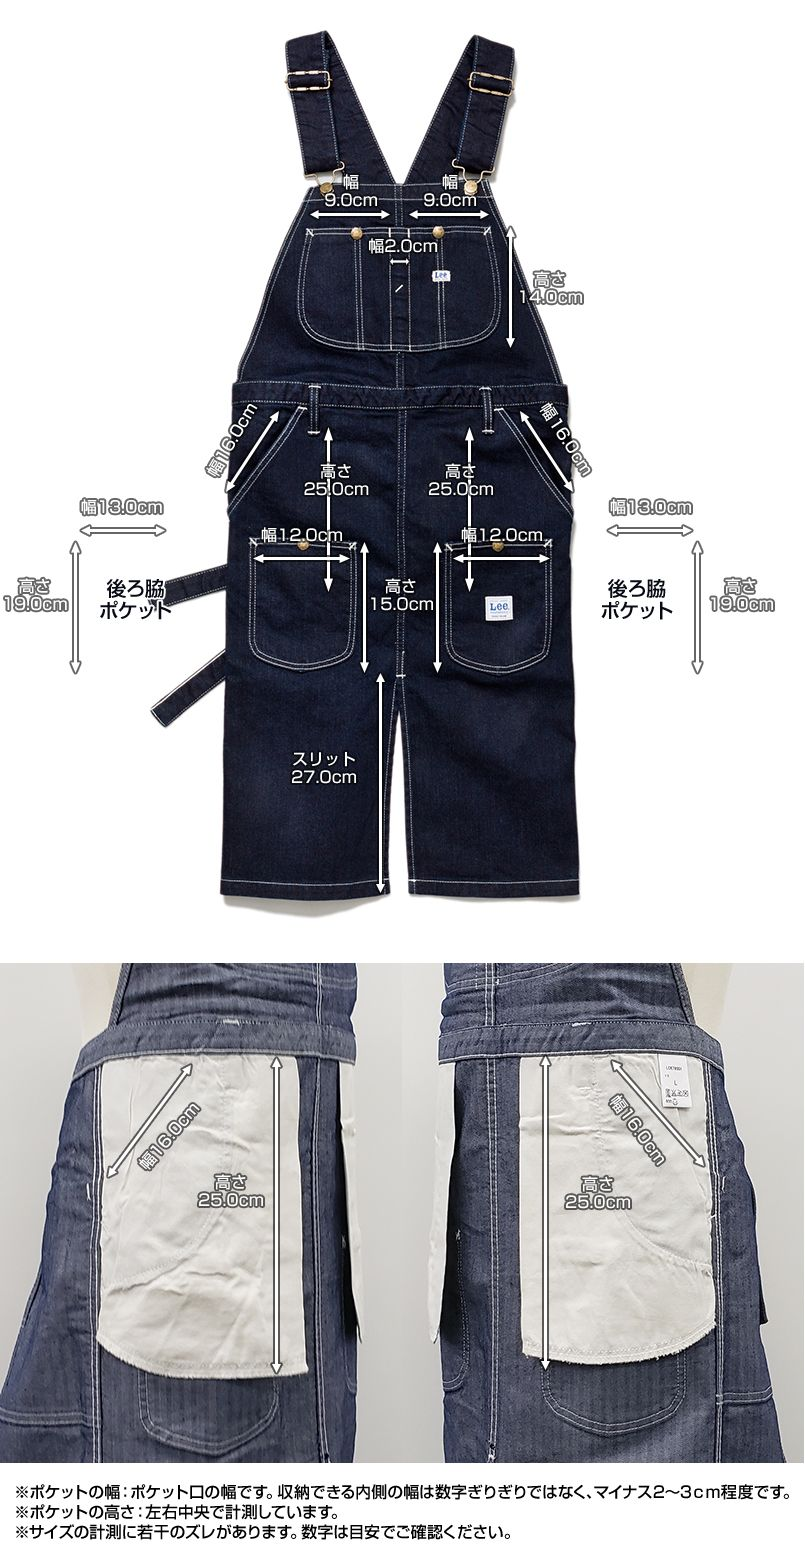 LCK79001 Lee オーバーオールエプロン(男女兼用) ポケットサイズ